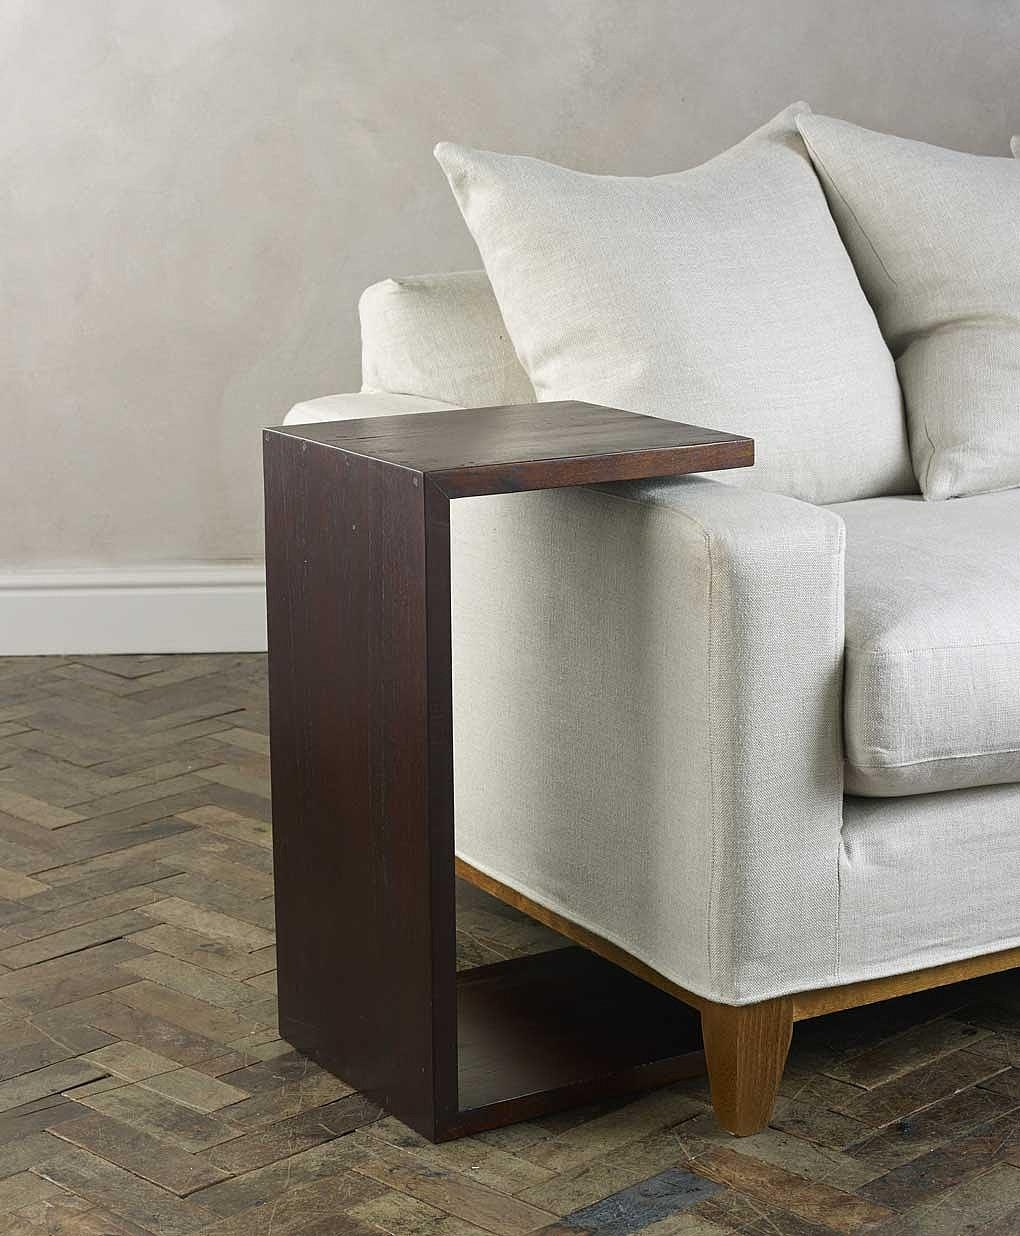 Slim Sofa End Table | Tehranmix Decoration In Slim Sofa Tables (Image 13 of 20)